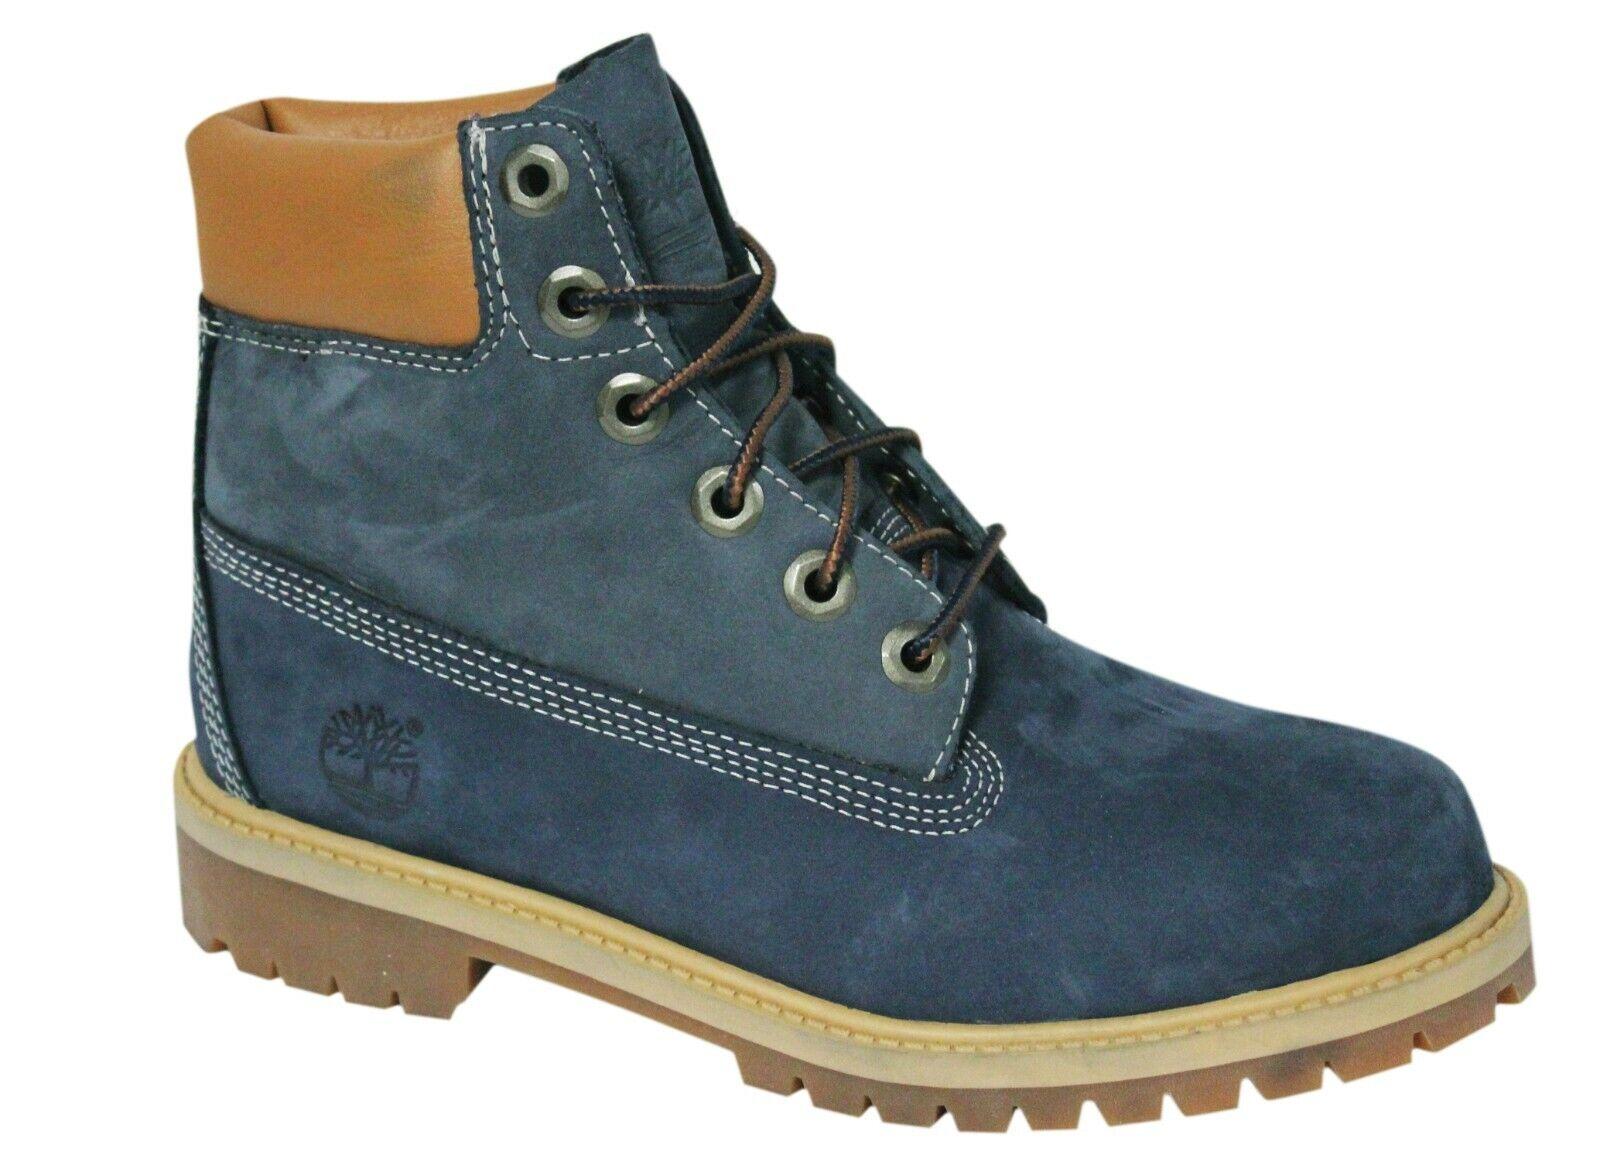 Details about Timberland 15.2cm premium waterproof leather boots lace juniors a14zd b58e show original title